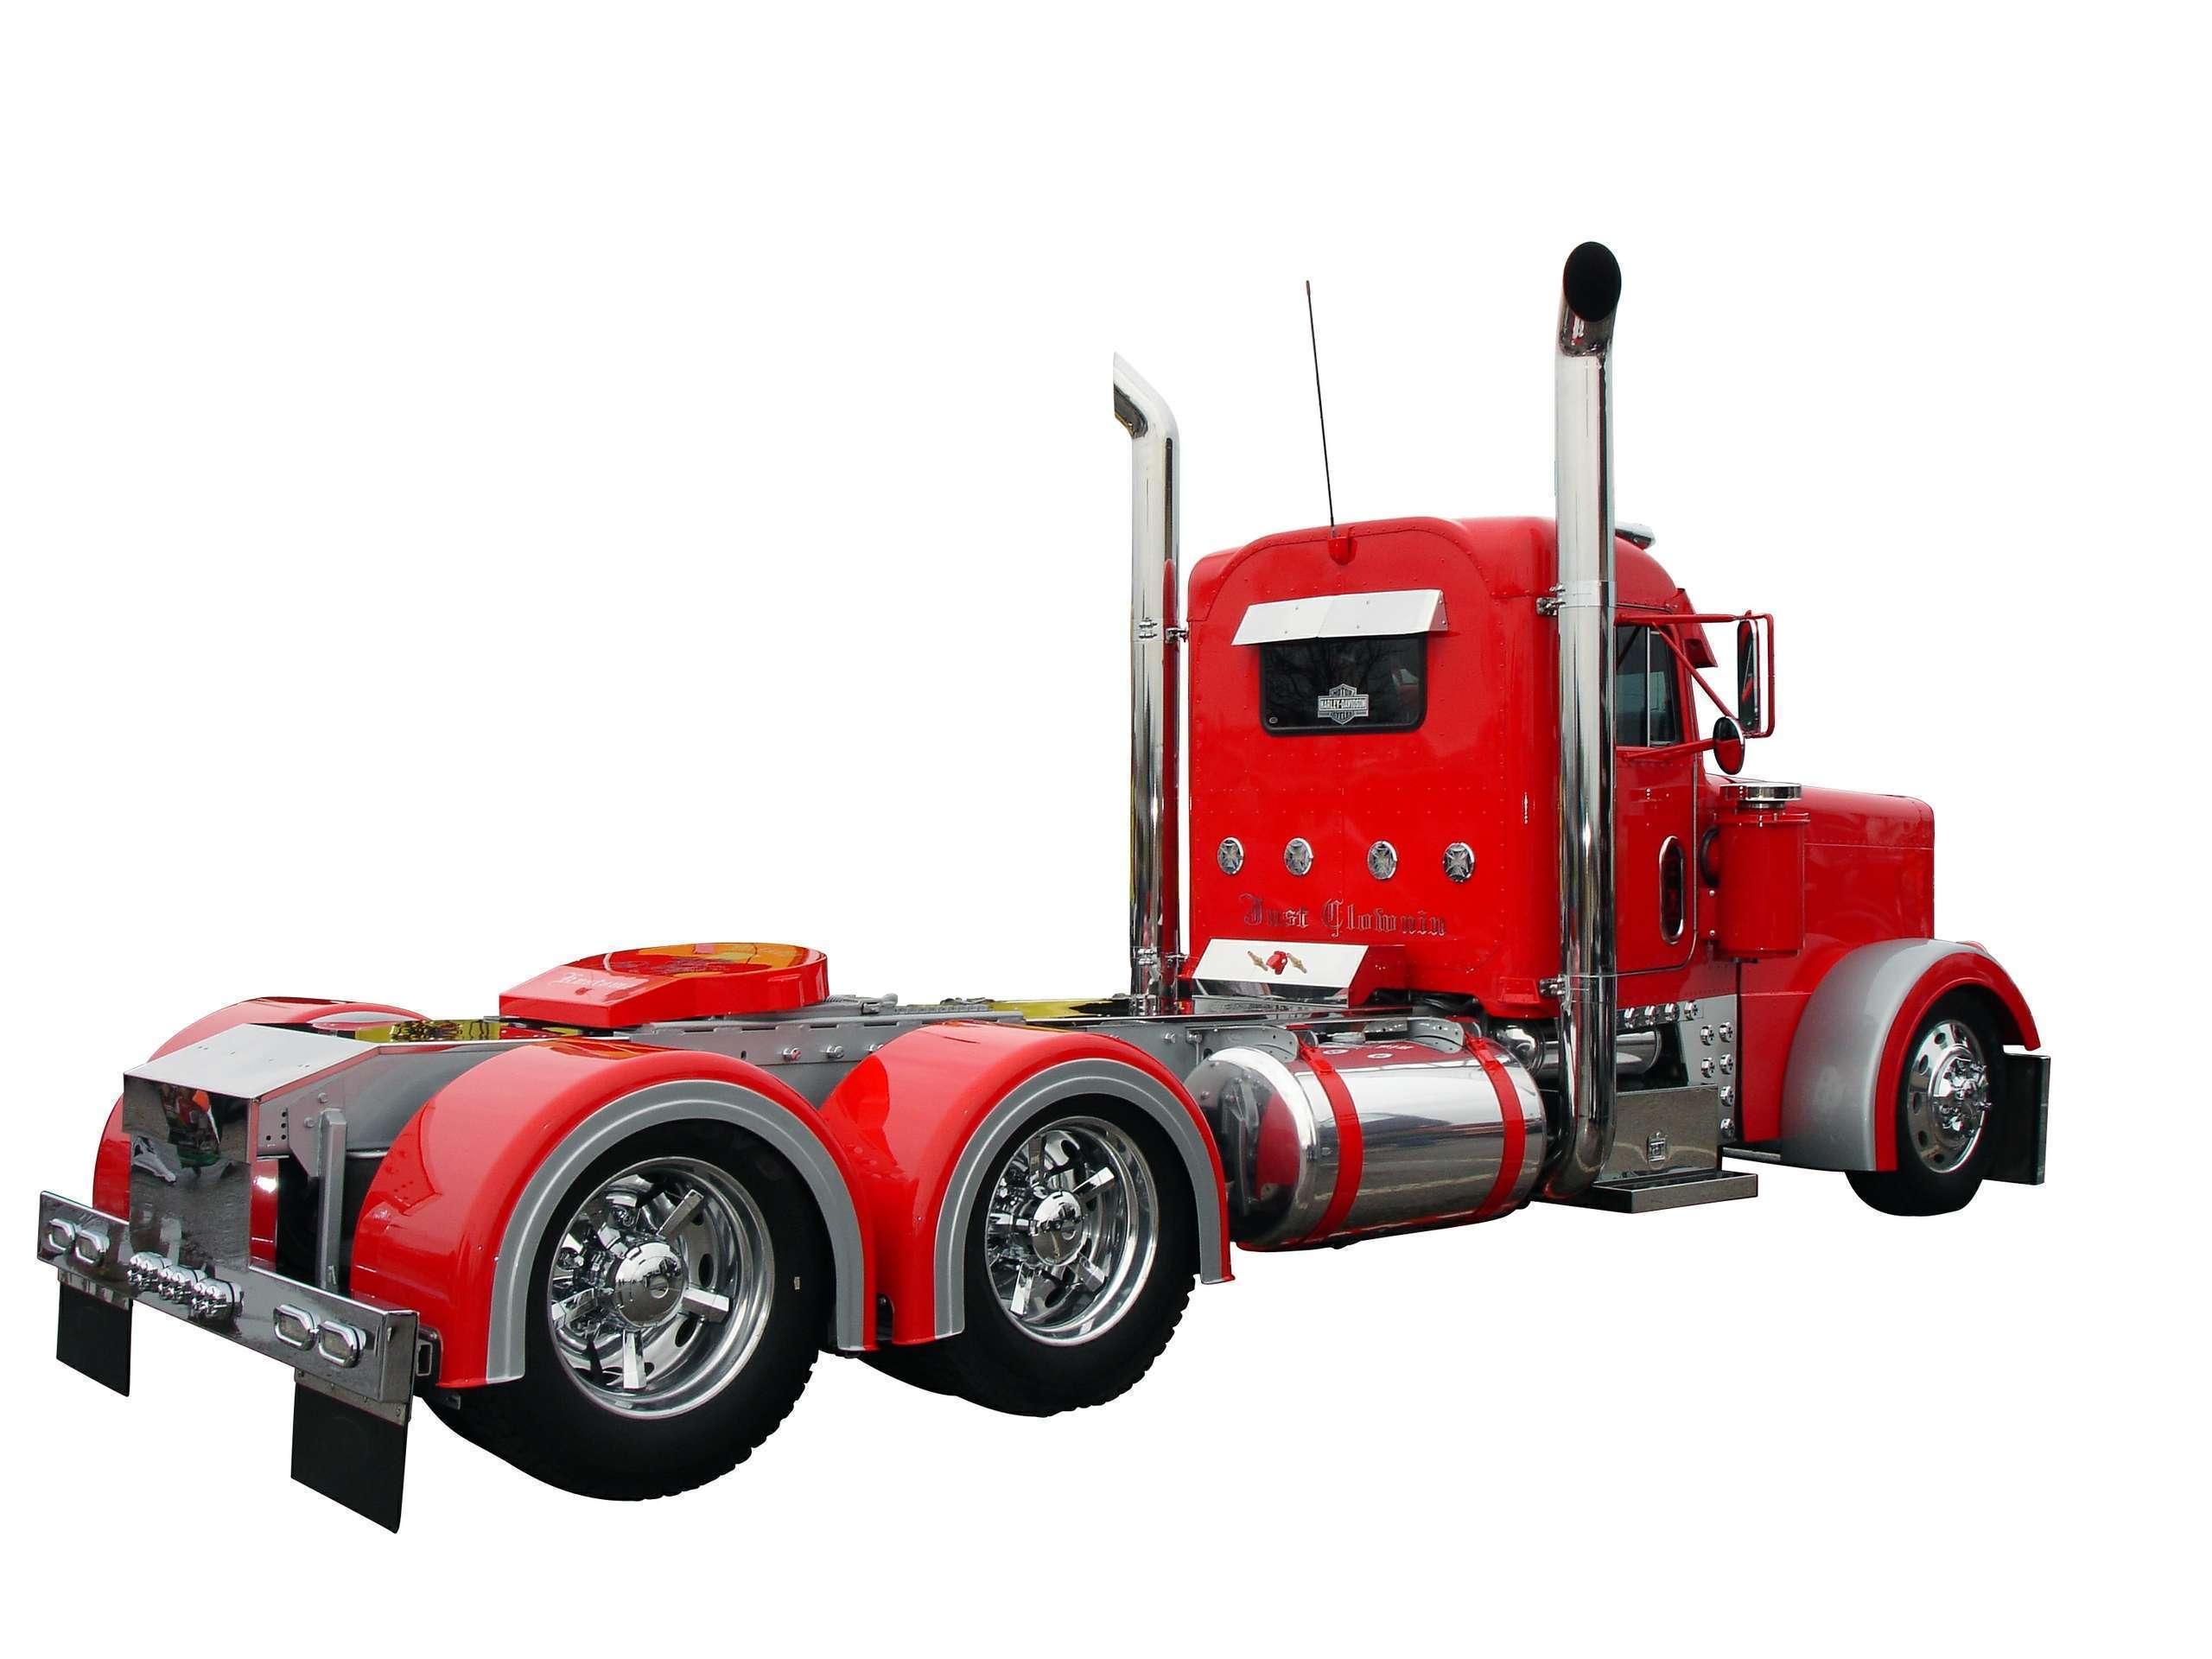 Semi Truck Wallpaper - Semi-trailer Truck , HD Wallpaper & Backgrounds